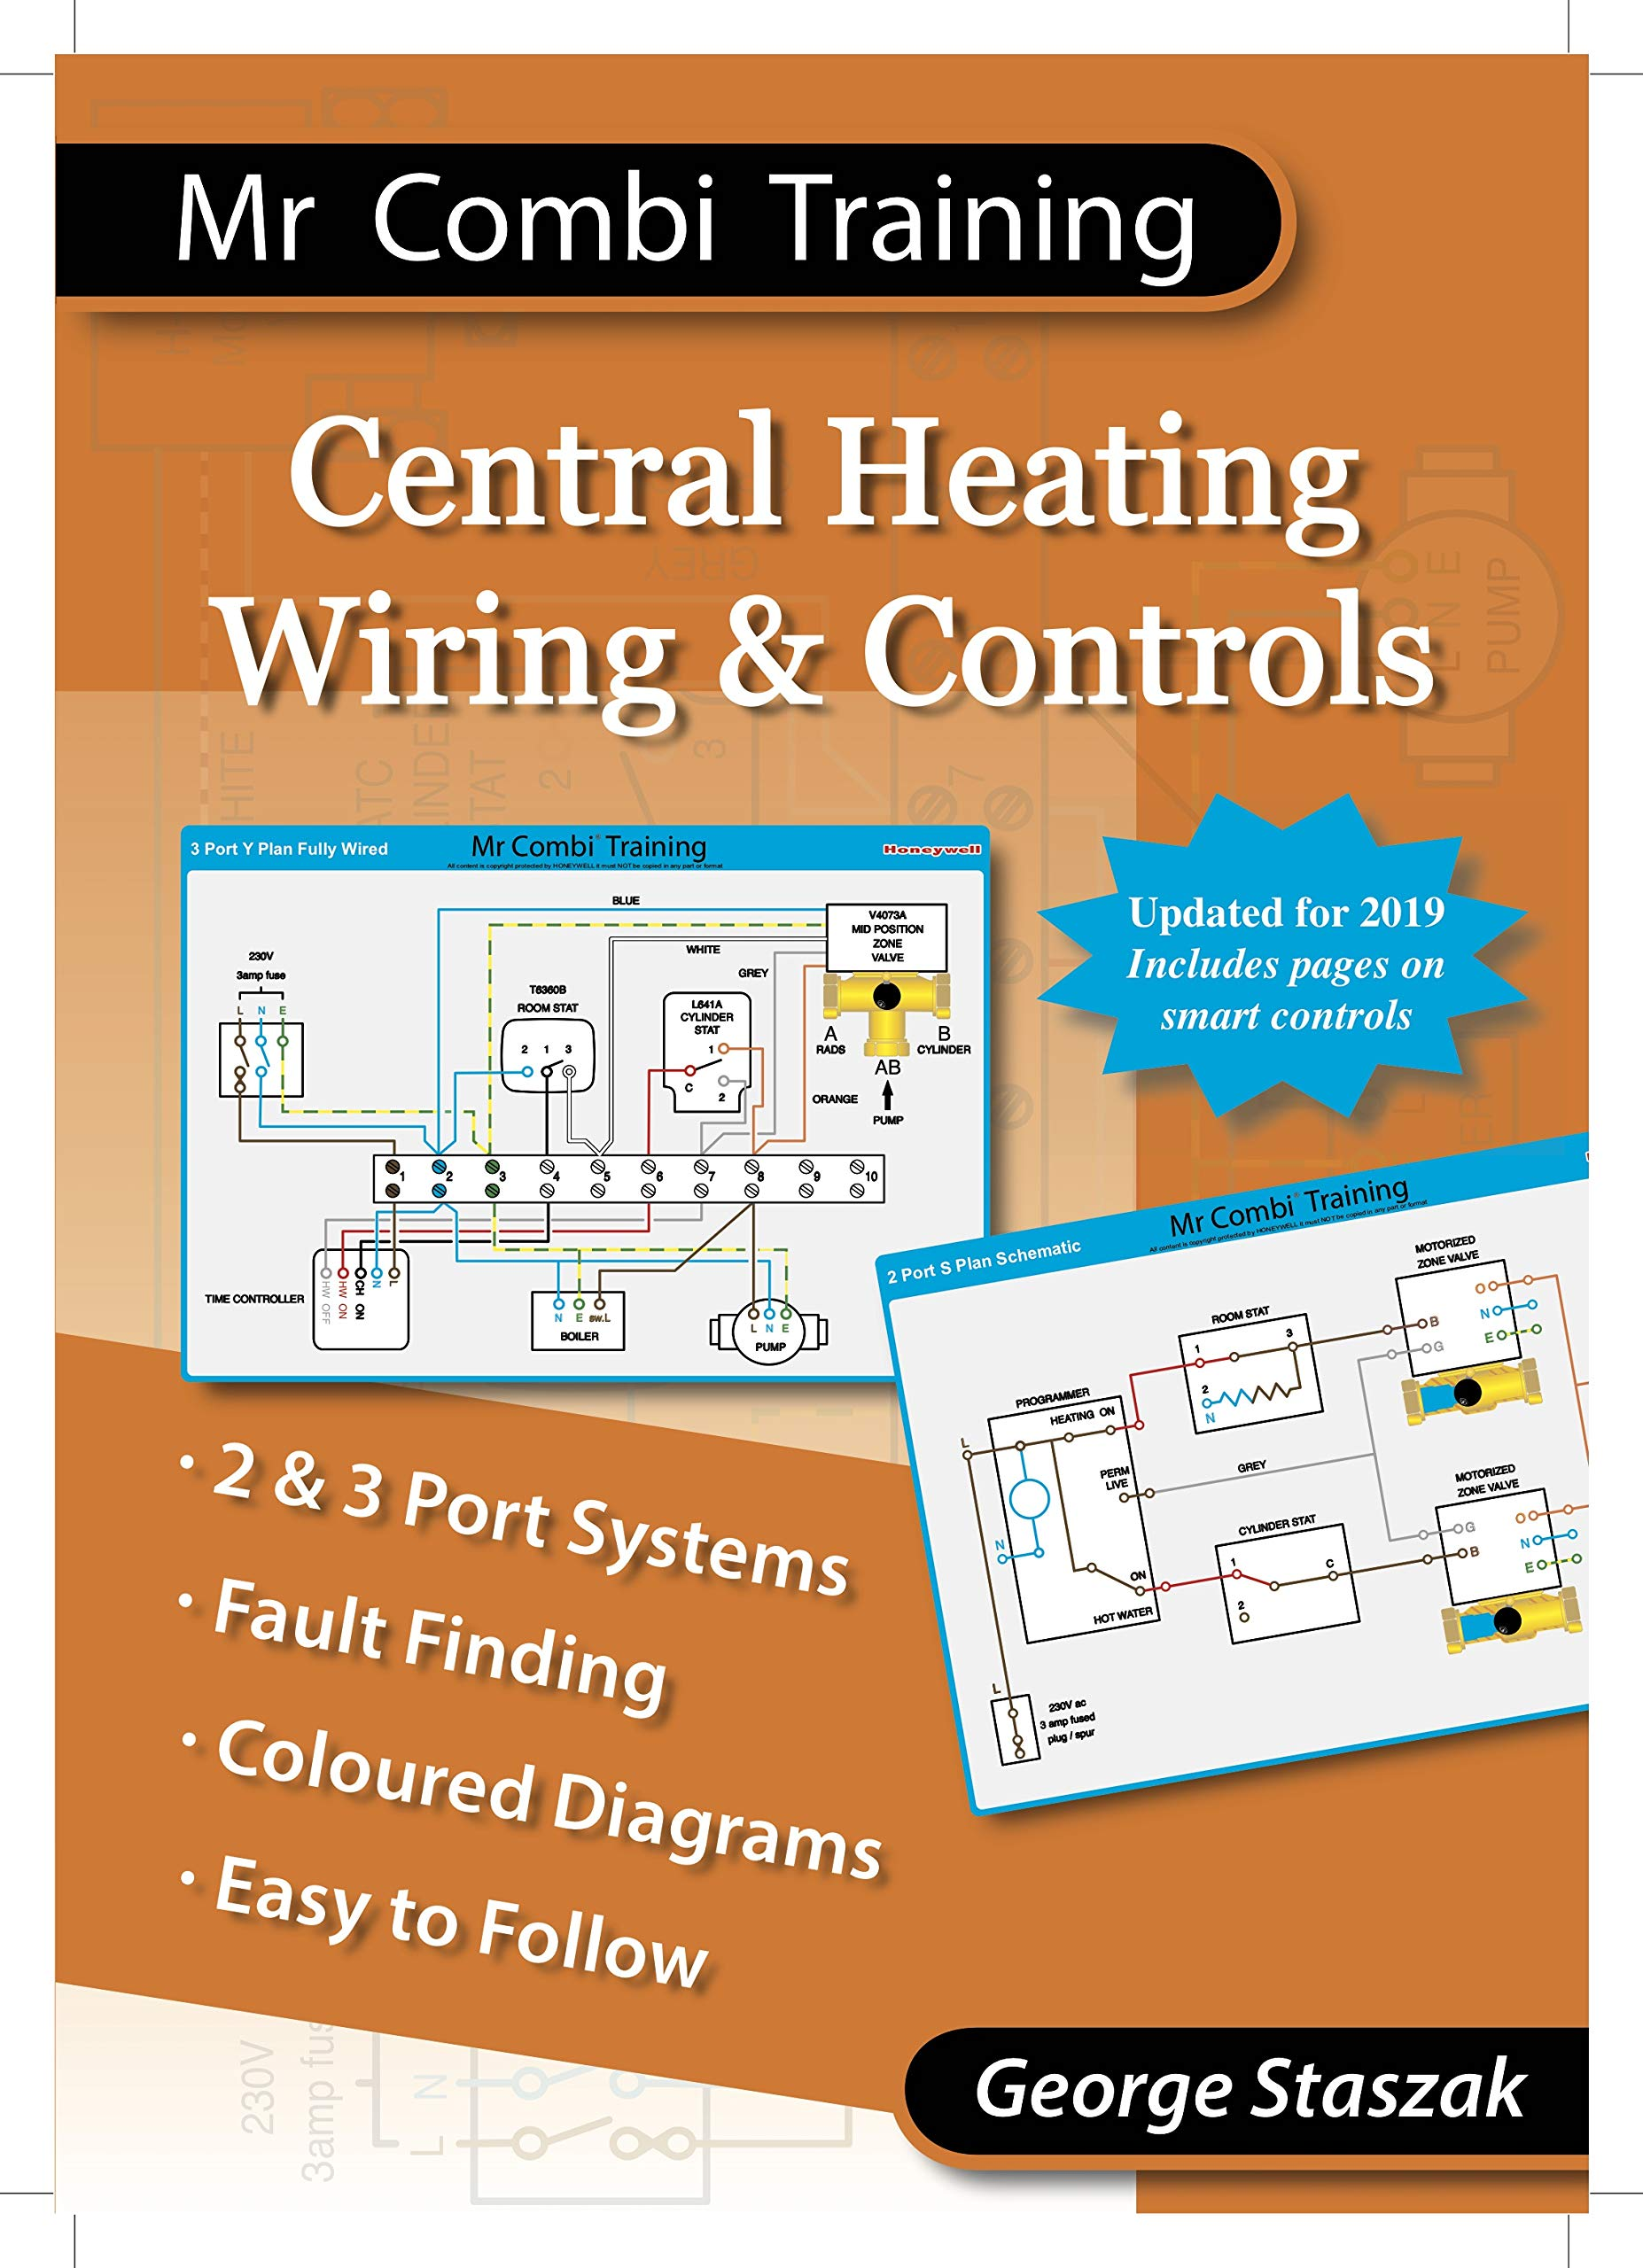 Phenomenal Central Heating Wiring Controls Amazon Co Uk George Staszak Wiring Cloud Onicaxeromohammedshrineorg